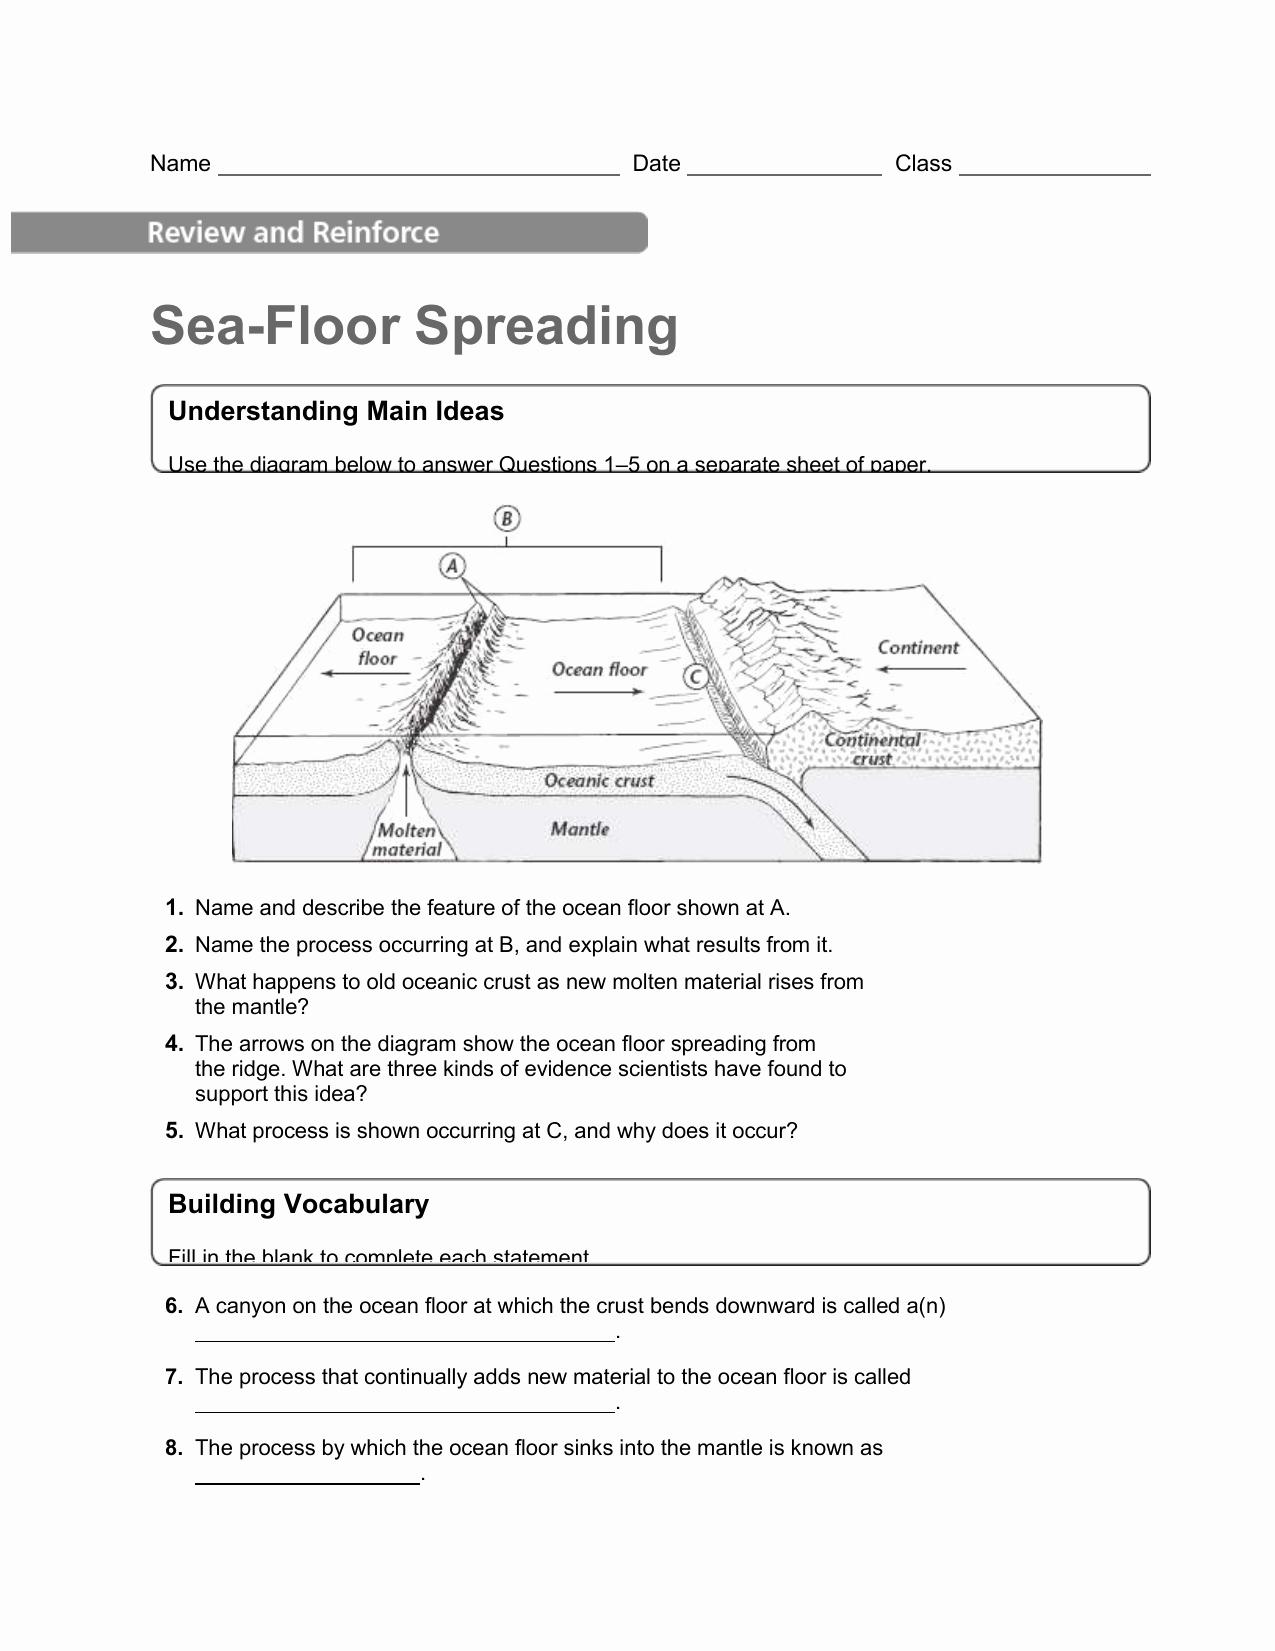 Sea Floor Spreading Worksheet Answer New Sea Floor Spreading Worksheet Answers